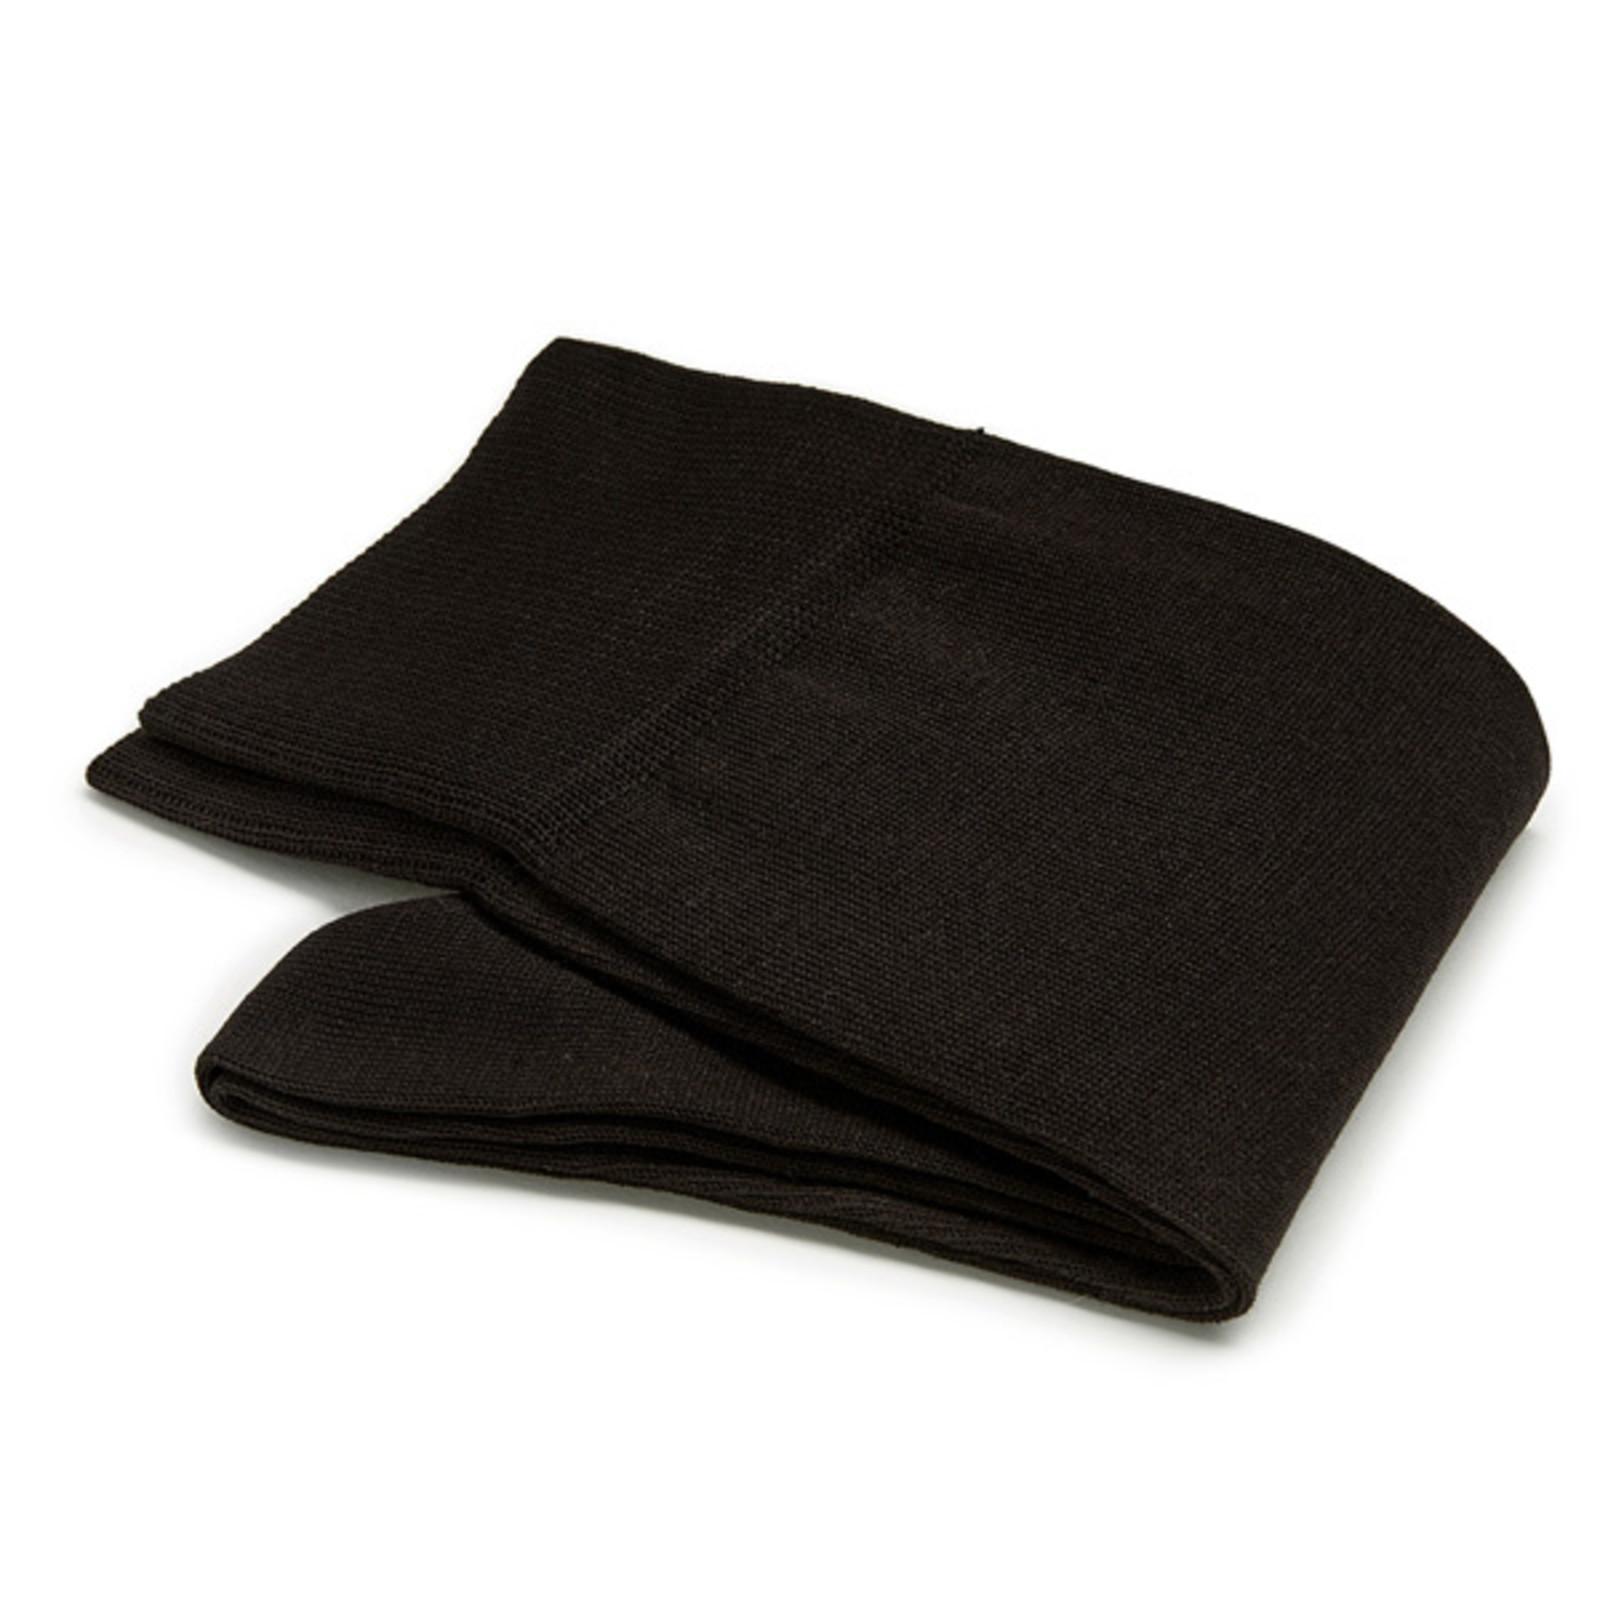 Carlo Lanza Dark brown socks cotton